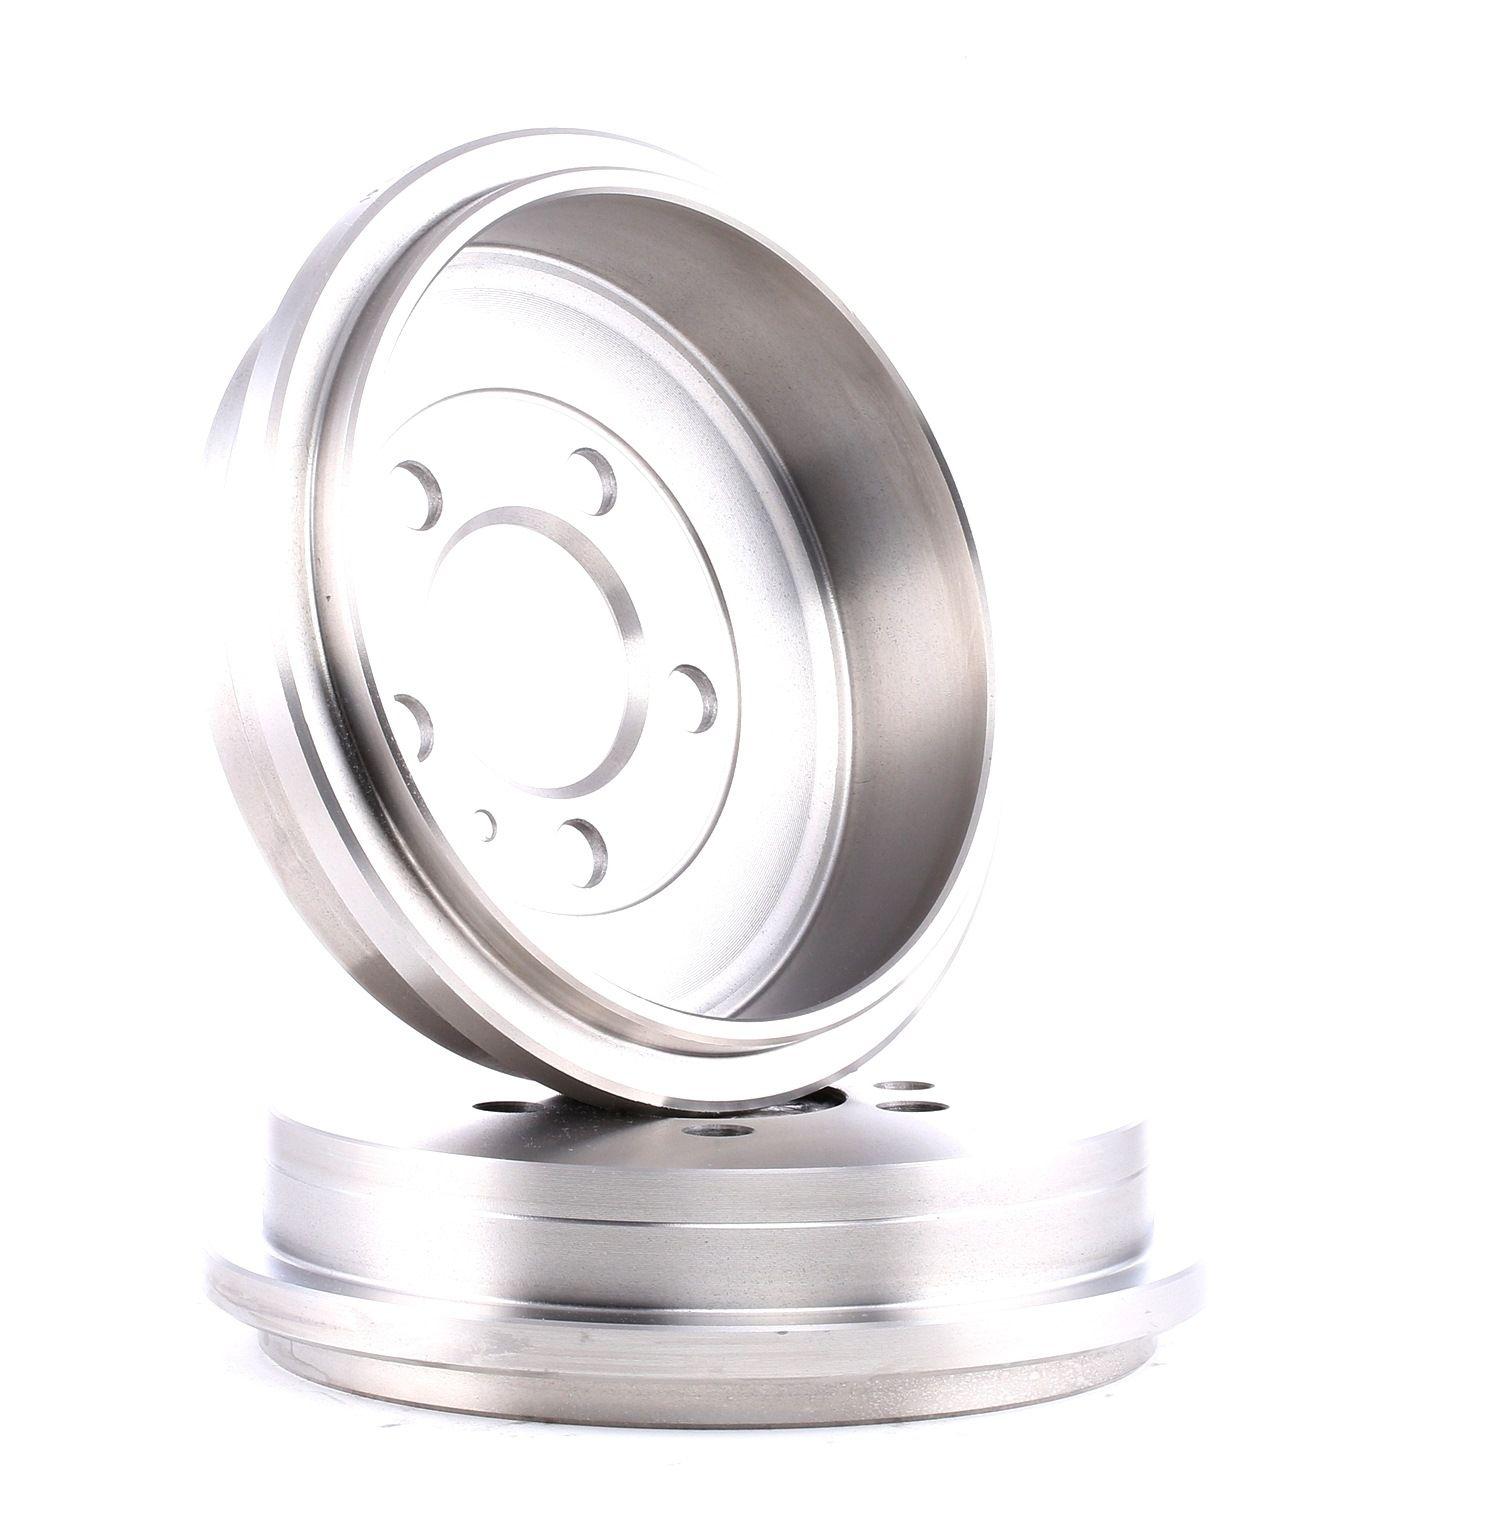 Bremstrommel MAXGEAR 19-0849 Bewertung